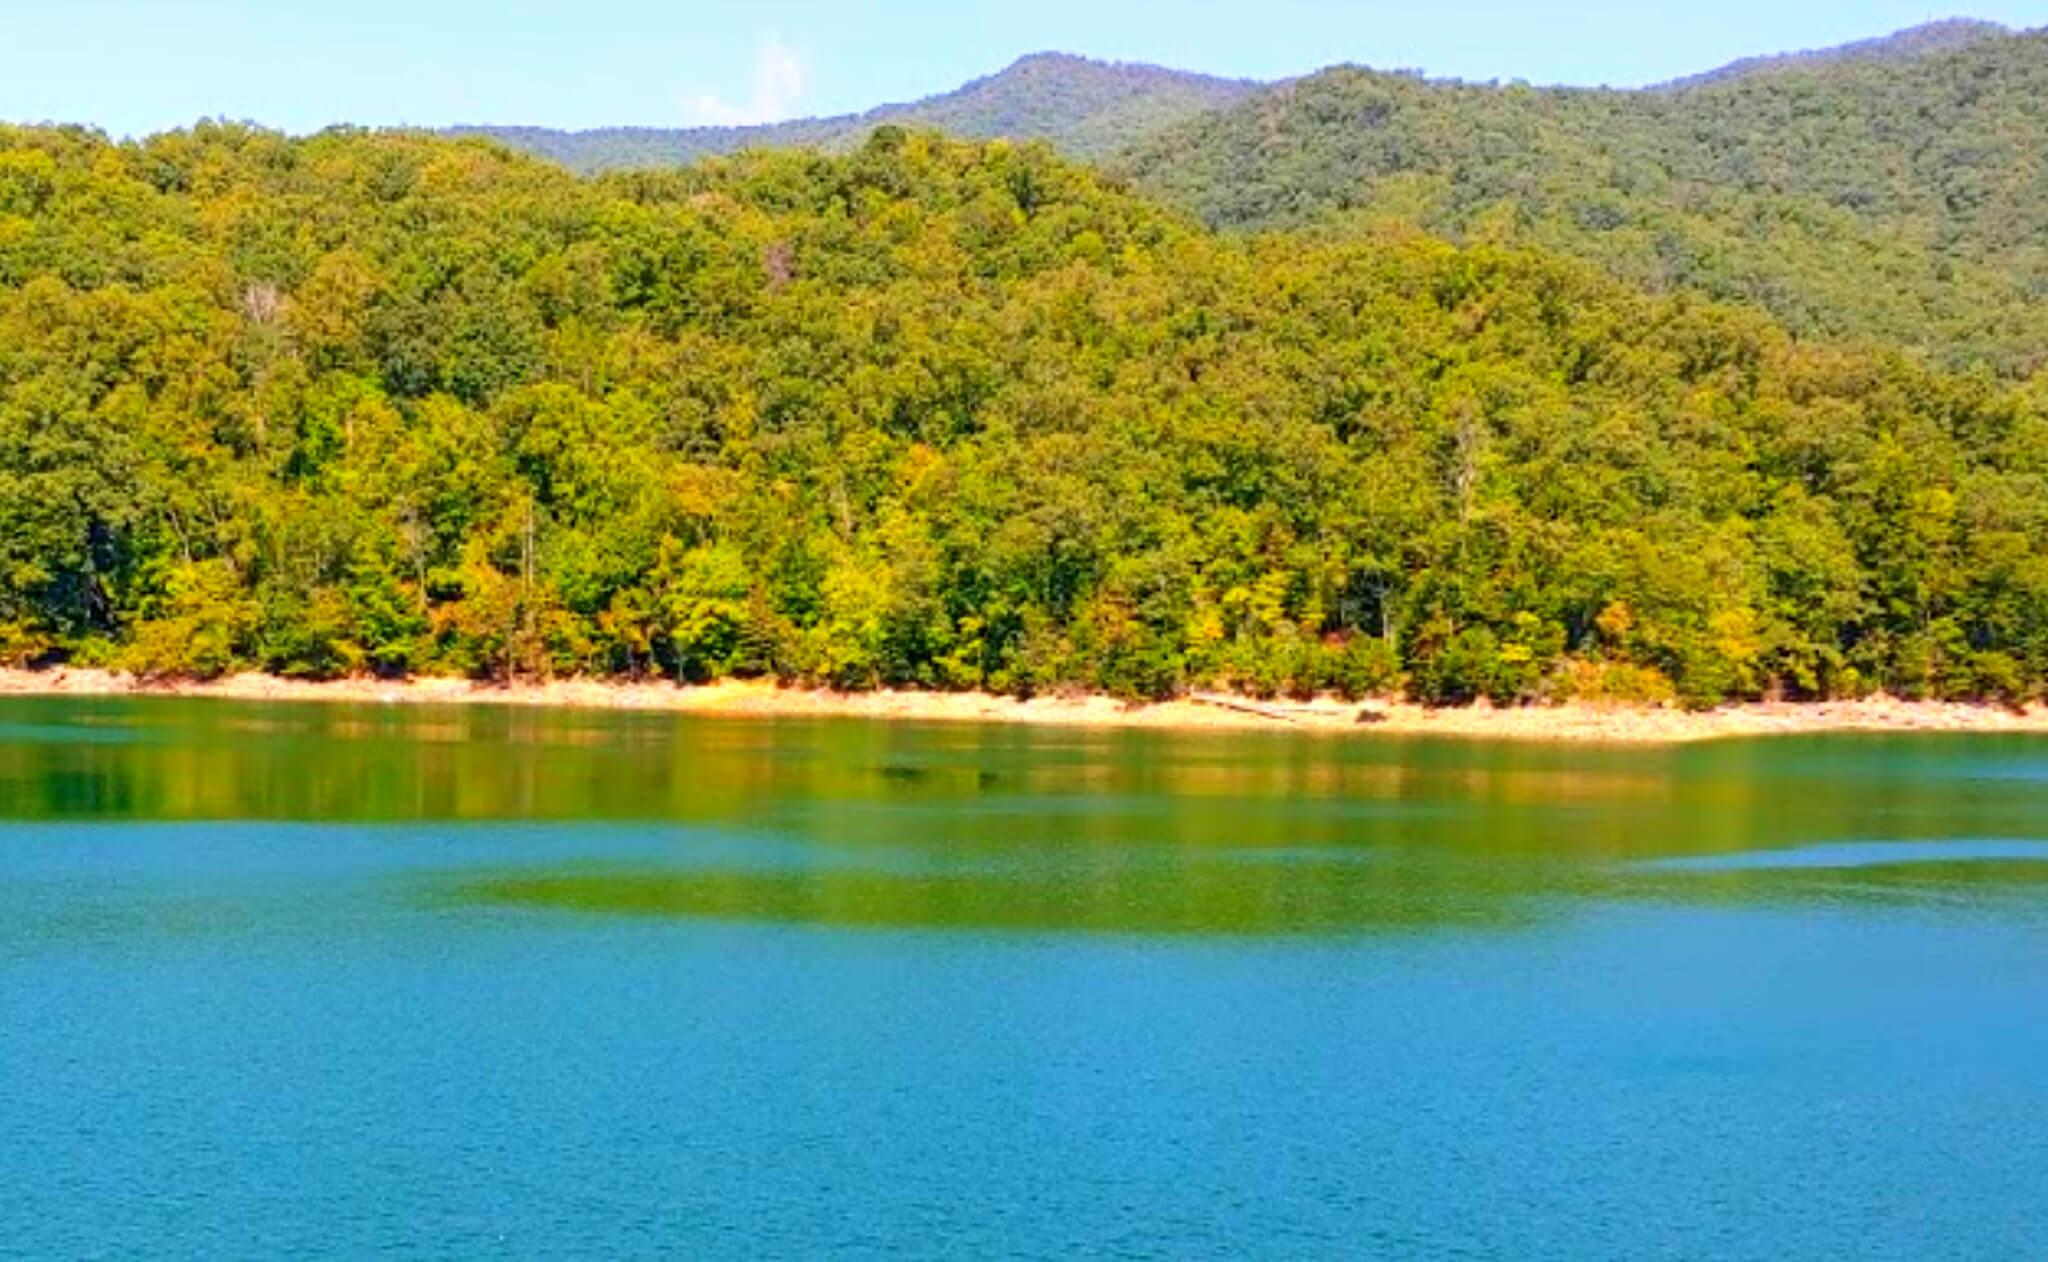 Fontana-Lake-Fishing-Report-Guide-North-Carolina-NC-04